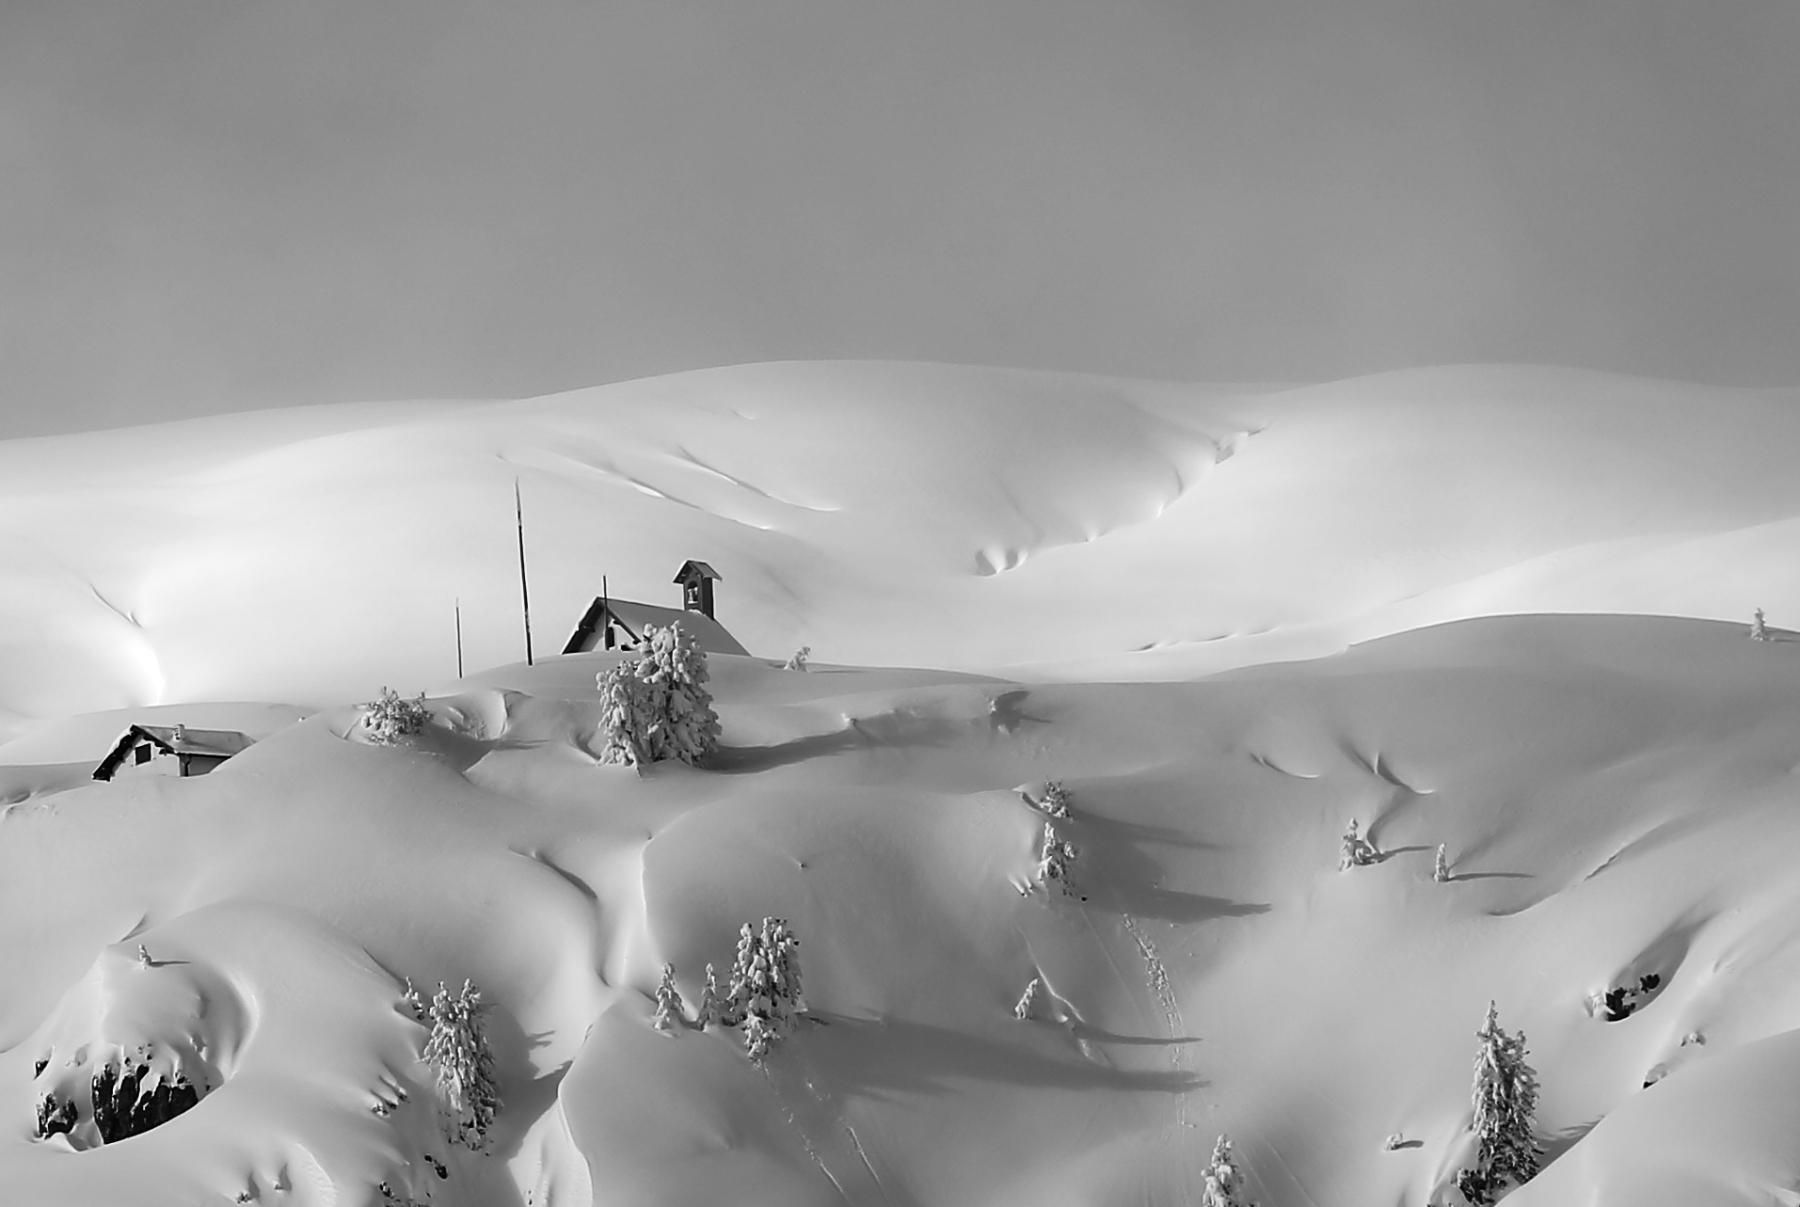 Chiesetta in alta montagna Misurina...